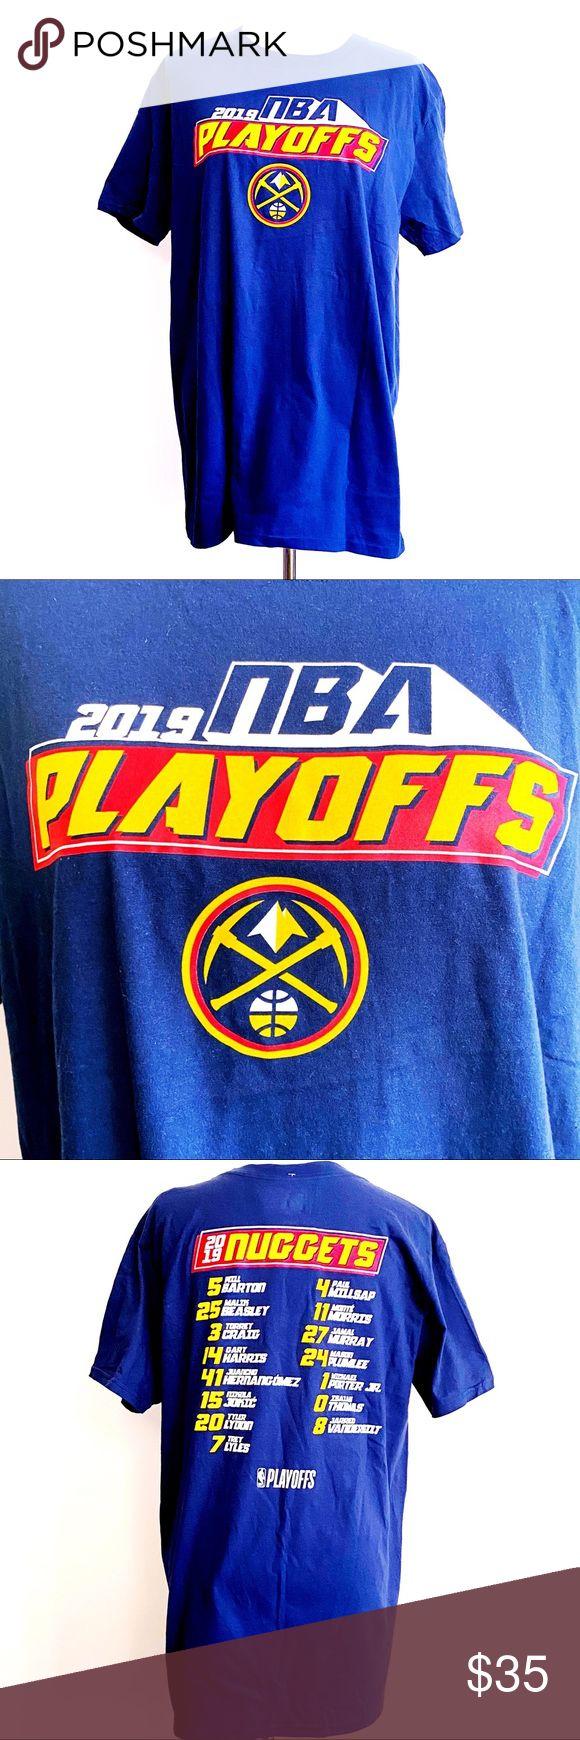 Denver Nuggets 2019 NBA Playoffs TShirt Shirt Top NWT in